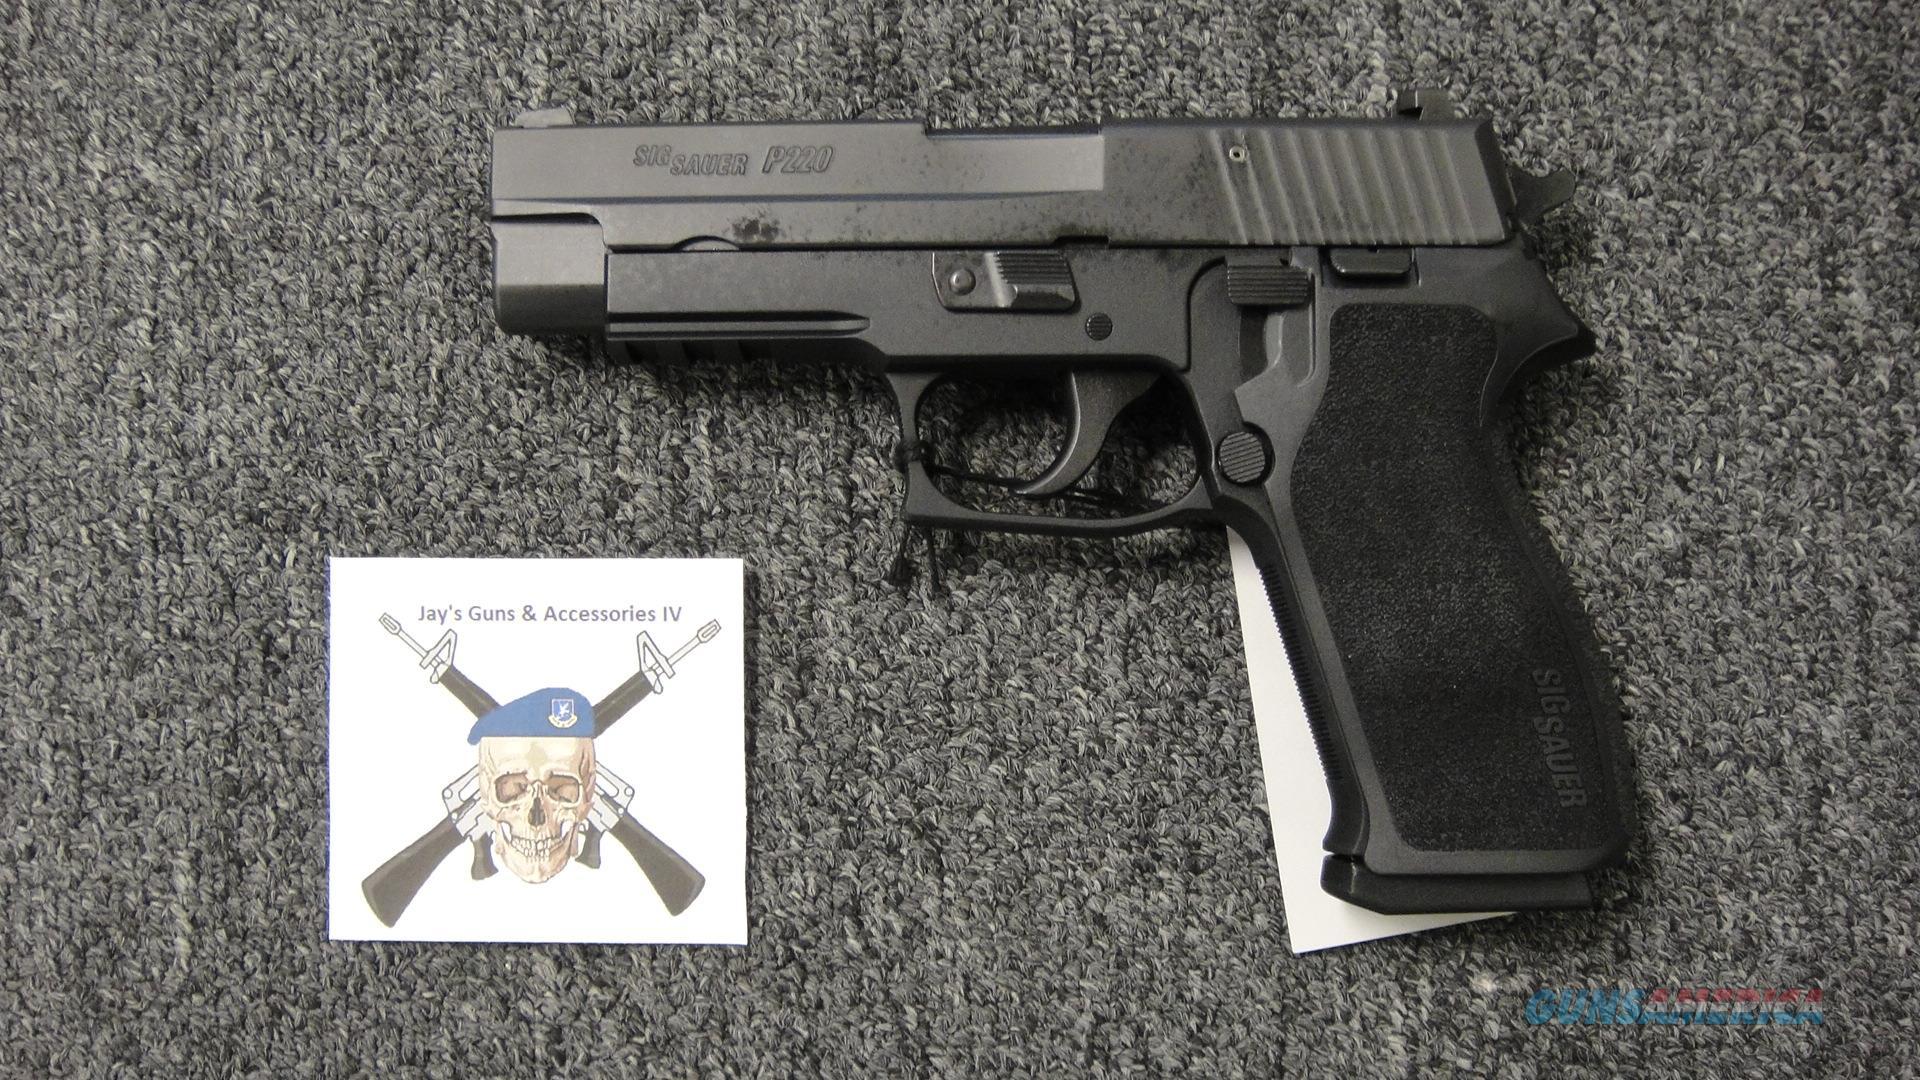 Sig Sauer P220 .45ACP  Guns > Pistols > Sig - Sauer/Sigarms Pistols > P220